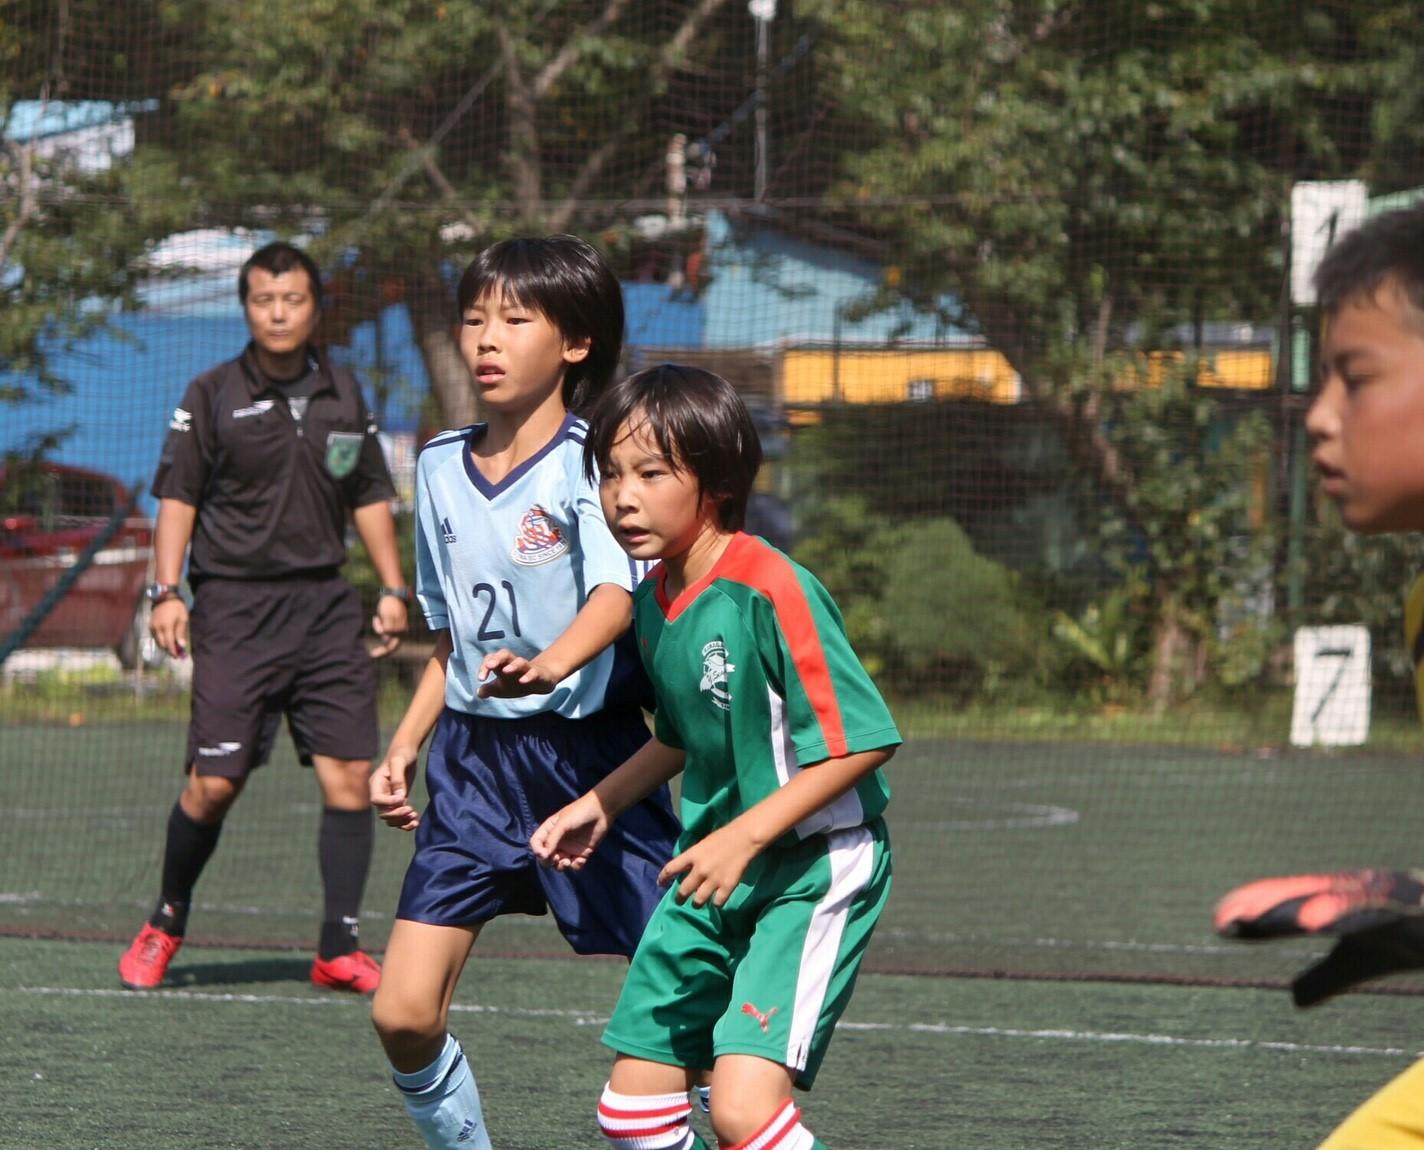 9月9日(土) U-12 第14回 横須賀少年少女フットサル大会